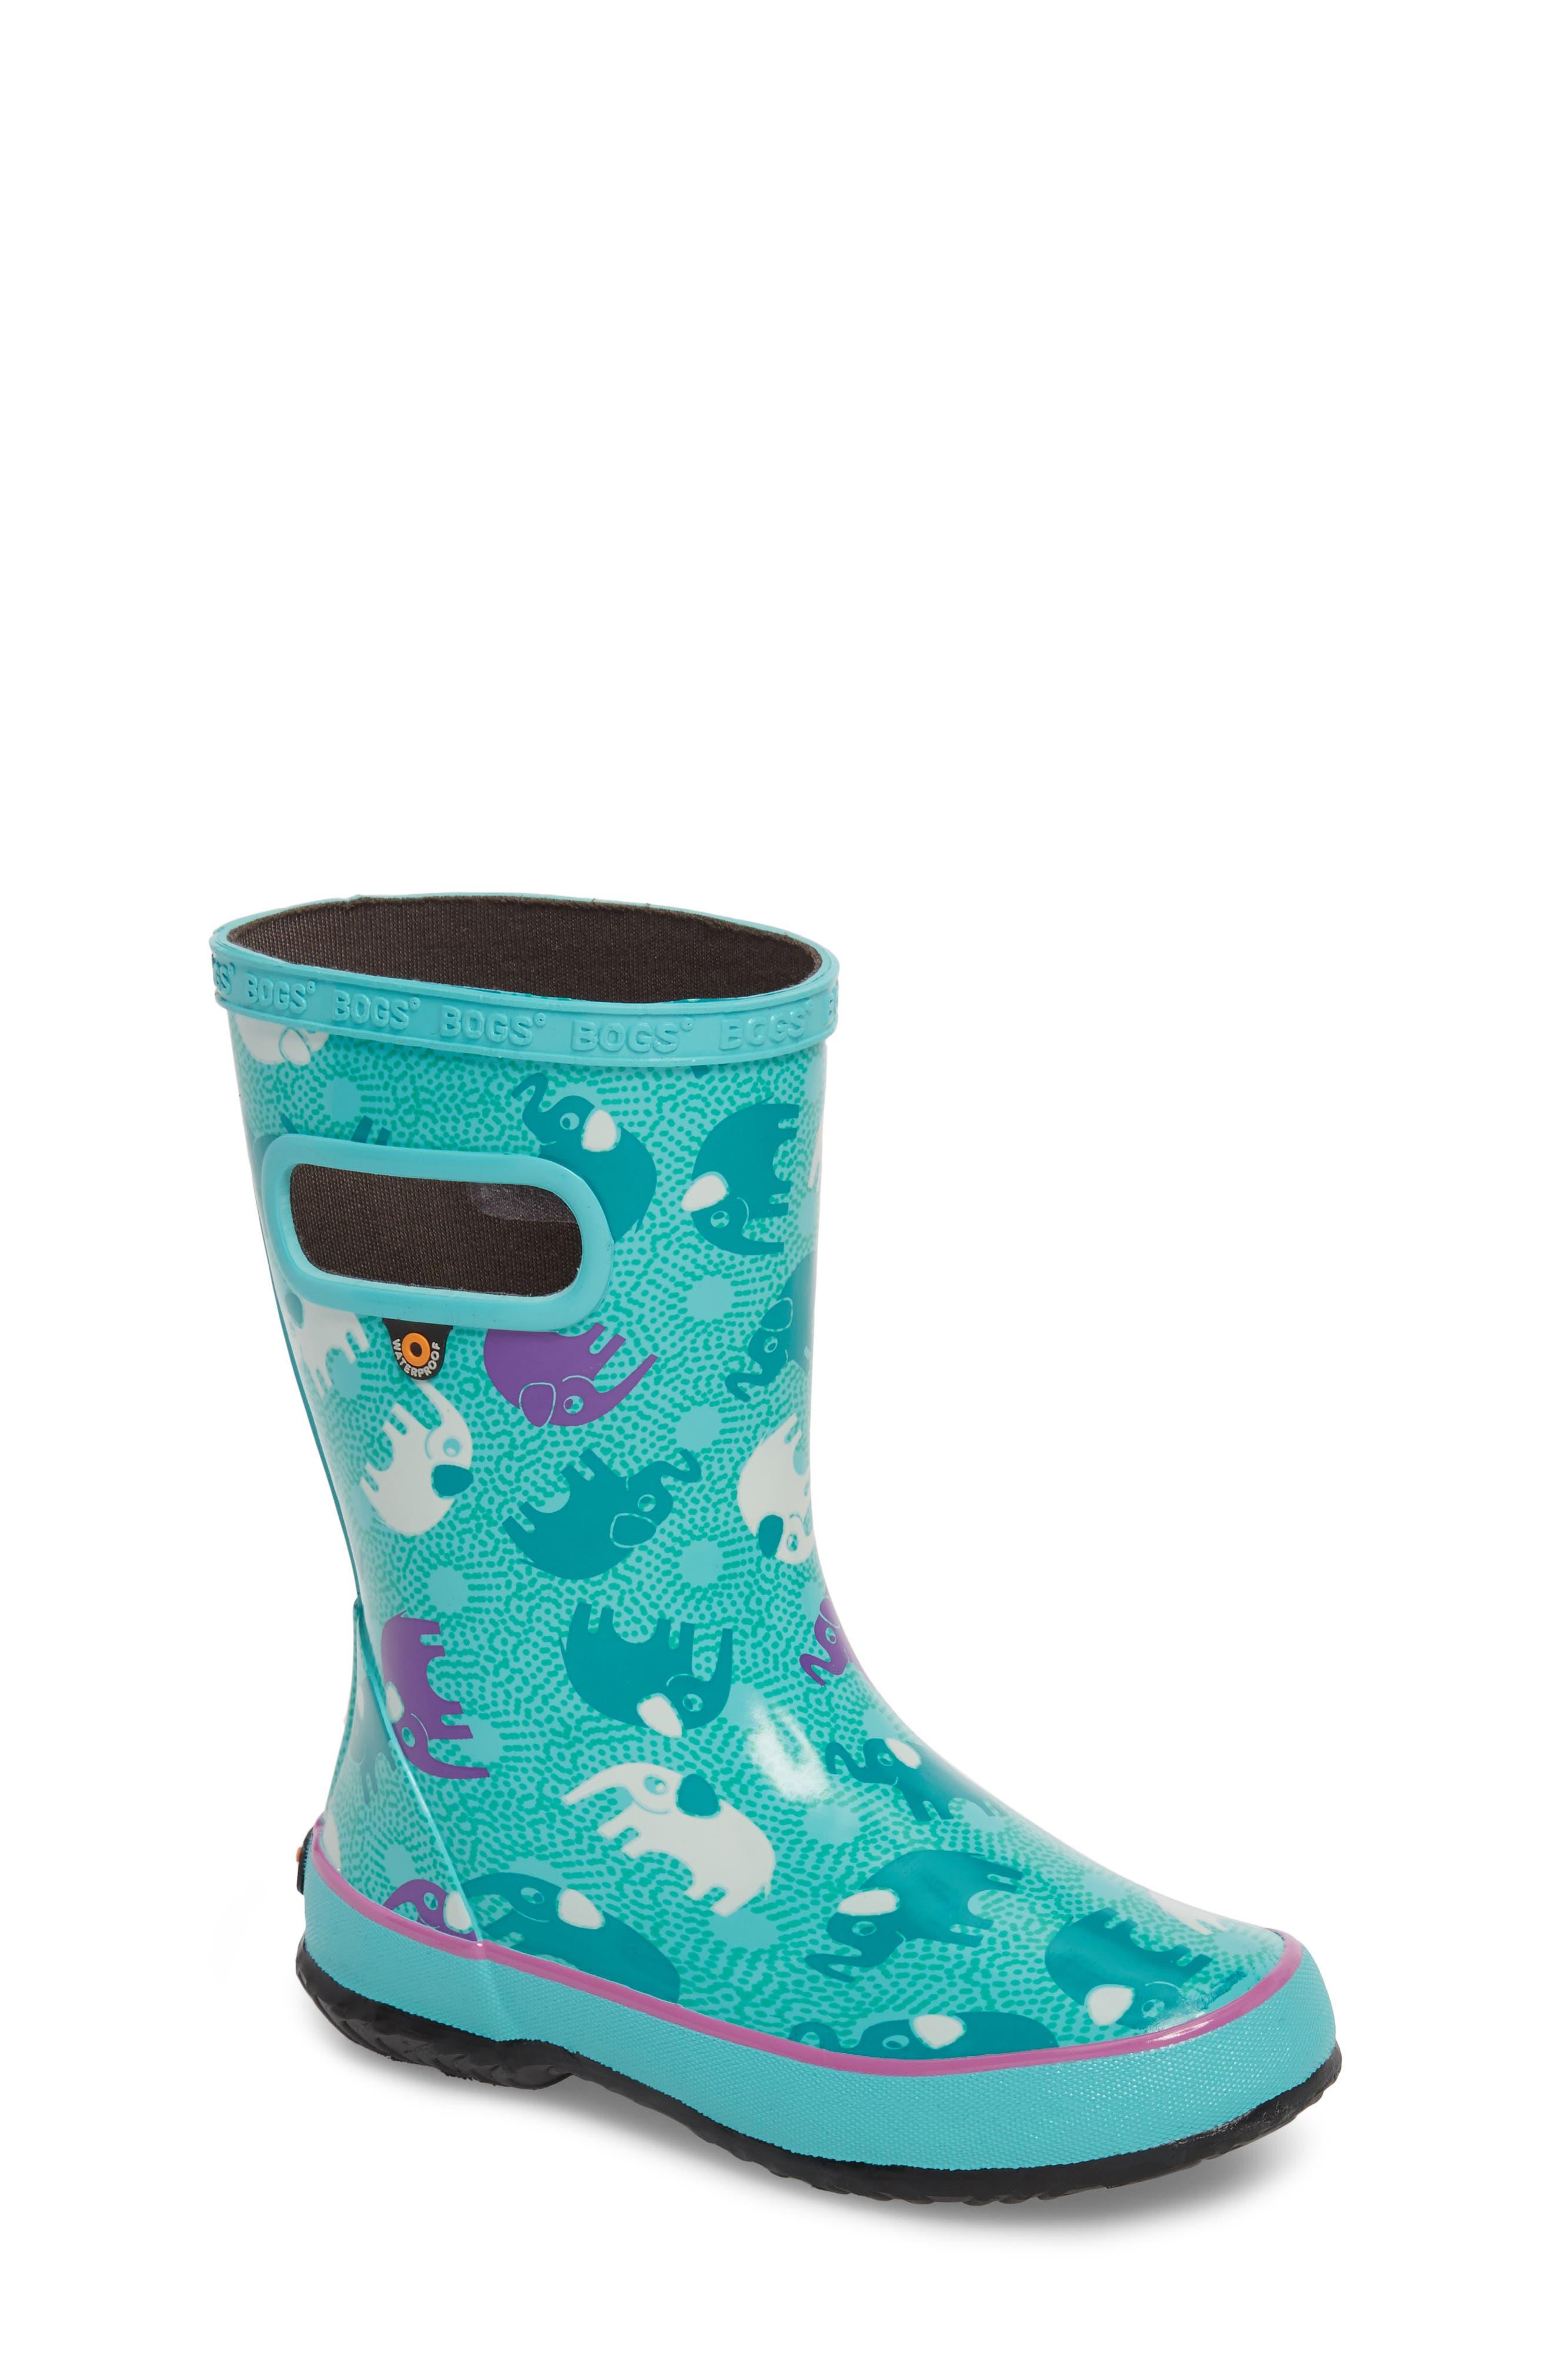 BOGS Skipper Elephant Print Rubber Waterproof Rain Boot, Main, color, TURQUOISE MULTI